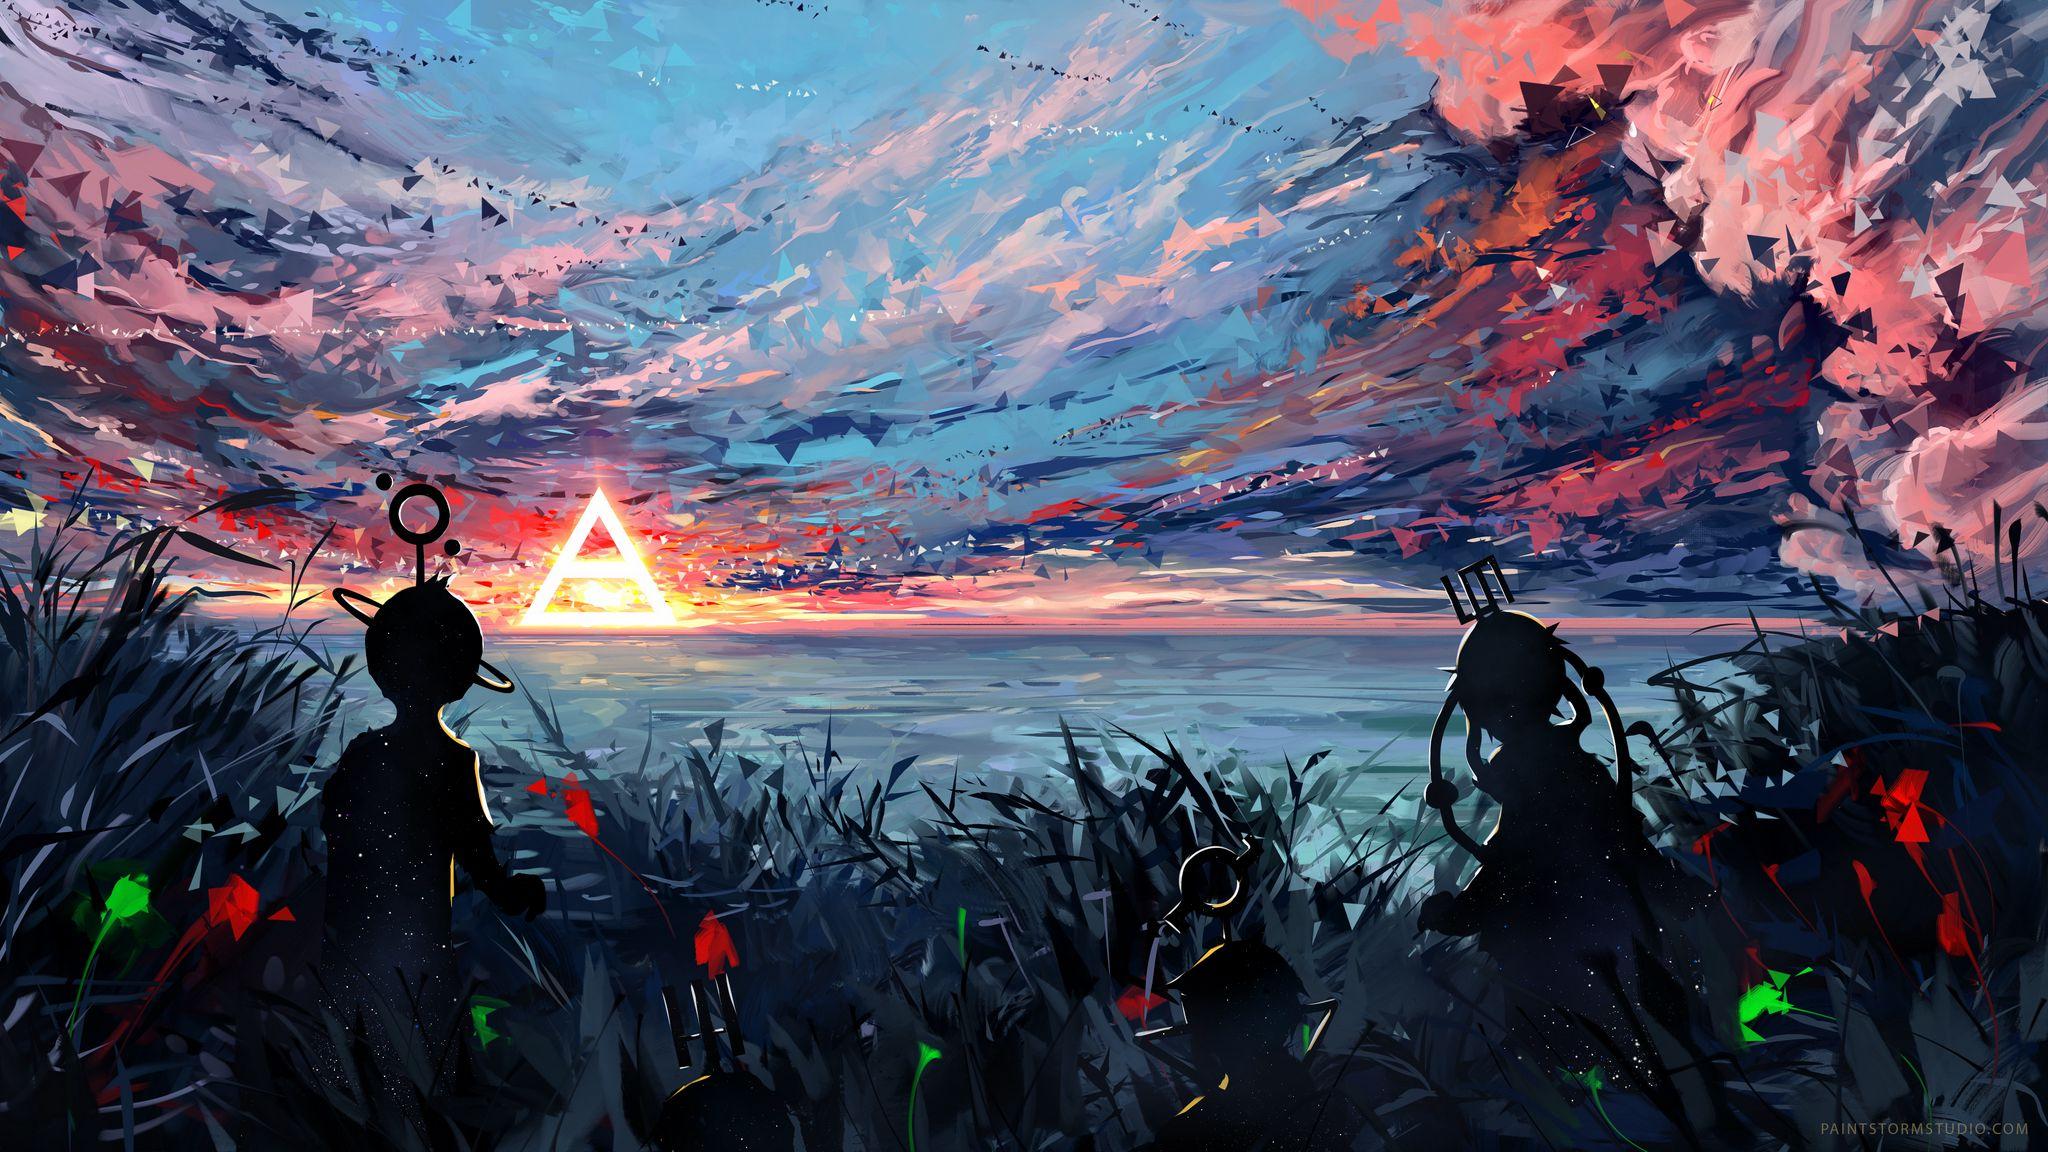 2048x1152 Wallpaper silhouette, art, sky, spots, colorful